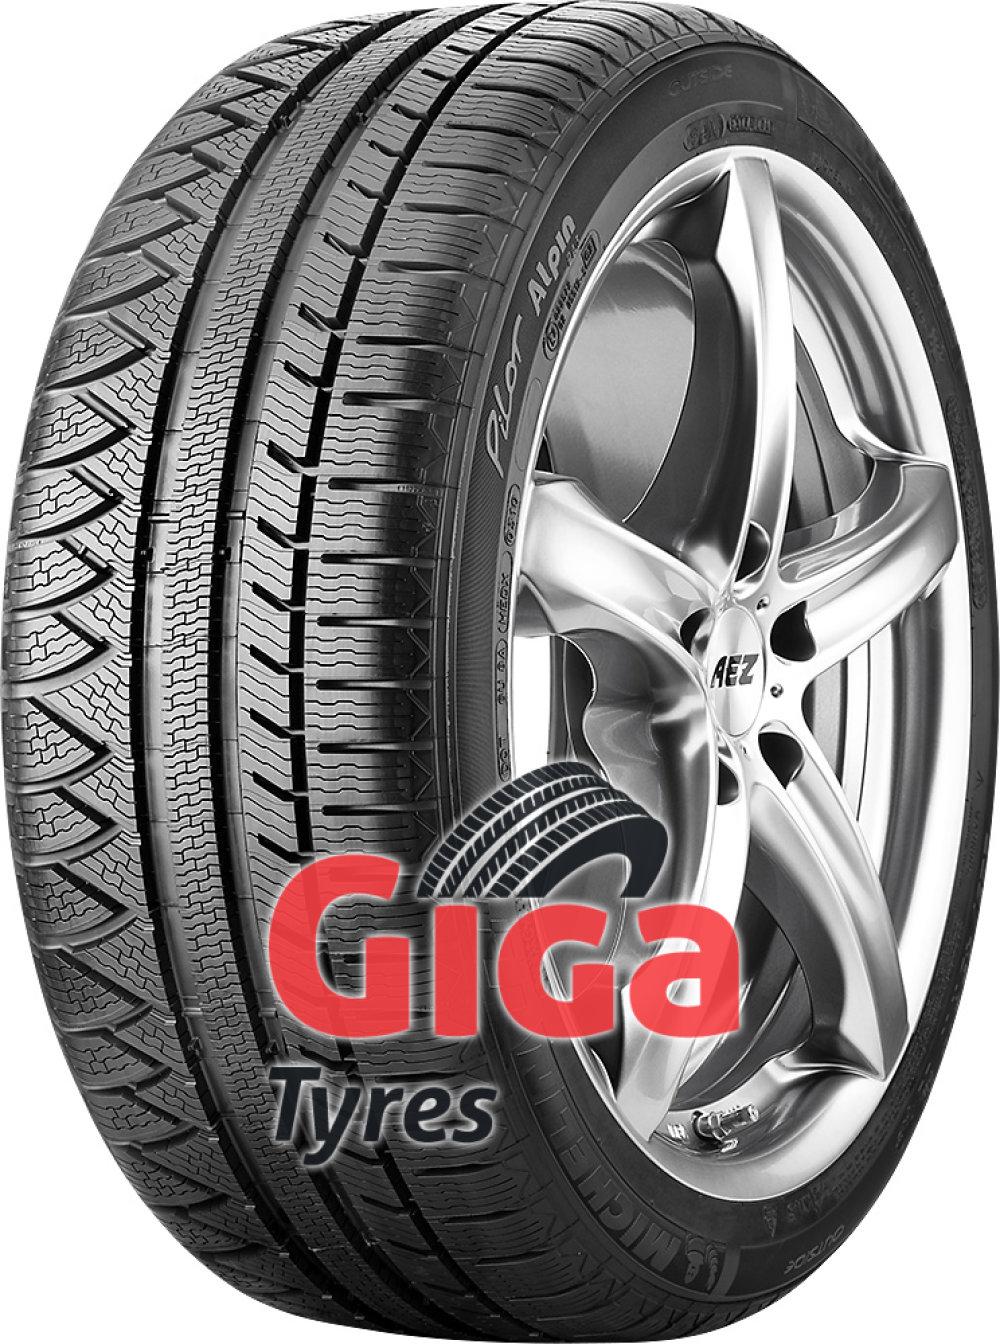 Michelin Pilot Alpin PA3 ( 245/45 R17 99V XL , MO, GRNX, with rim protection ridge (FSL) )